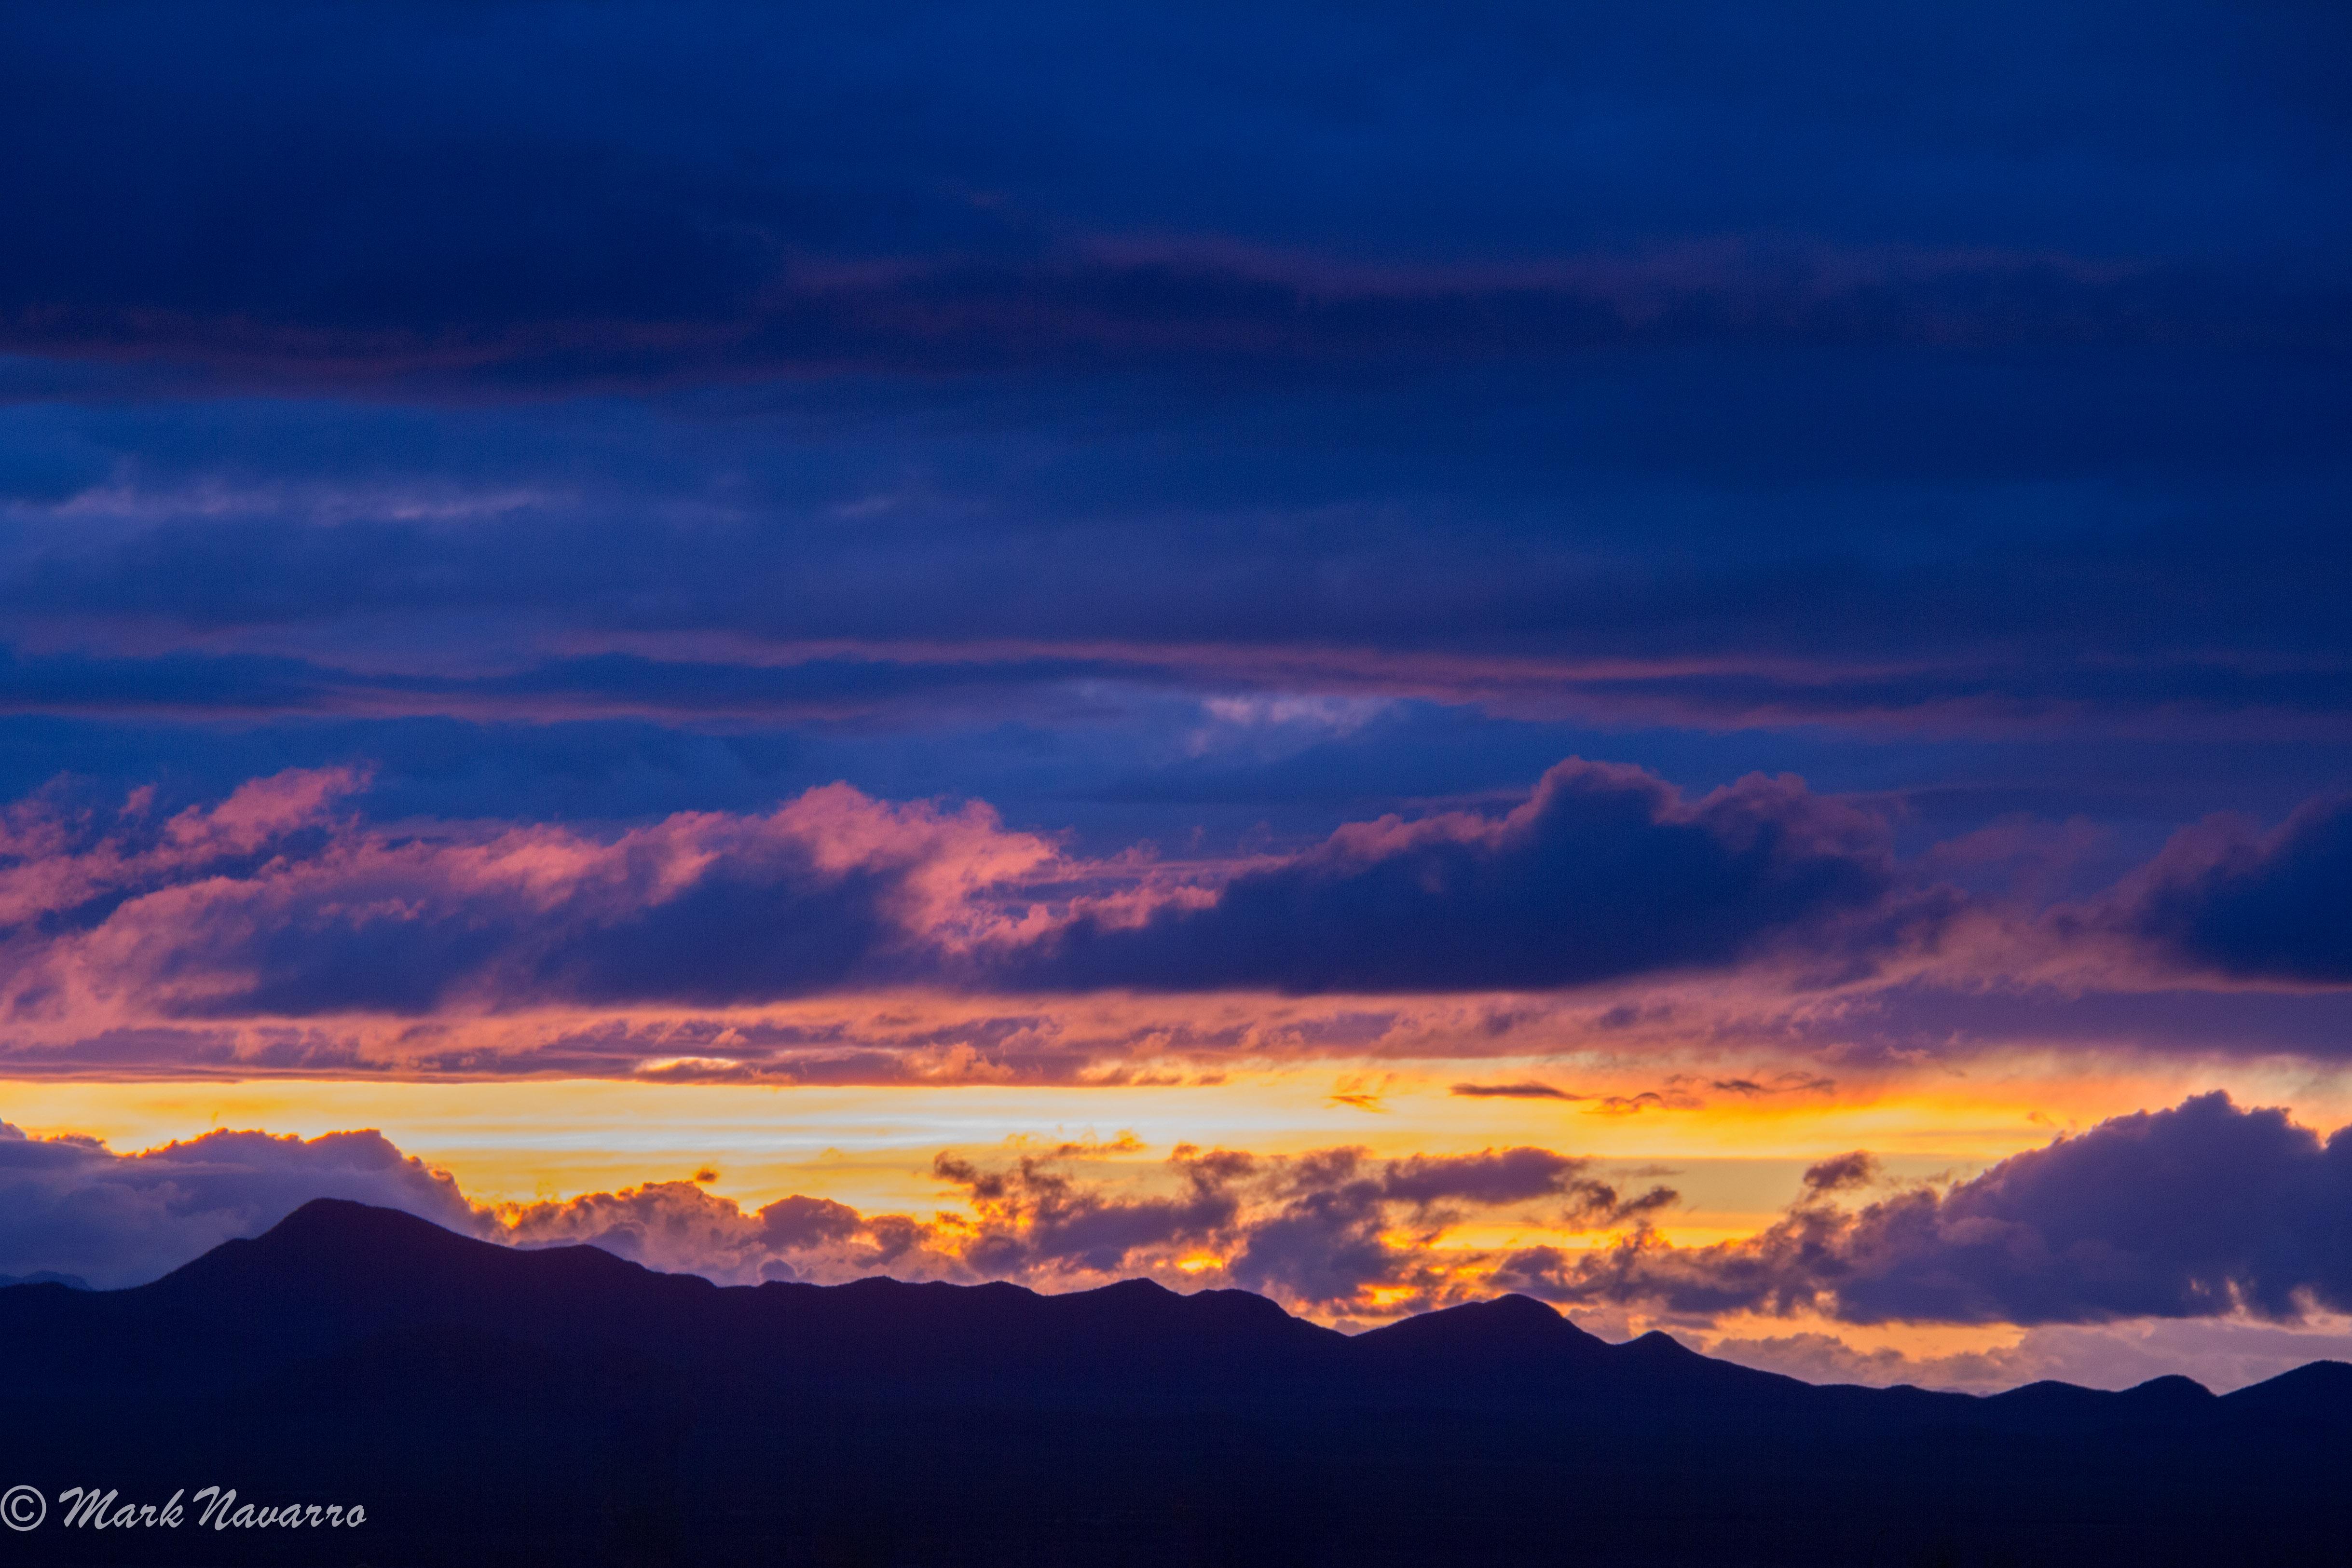 Wallpaper Sunlight Landscape Sunset Hill Purple